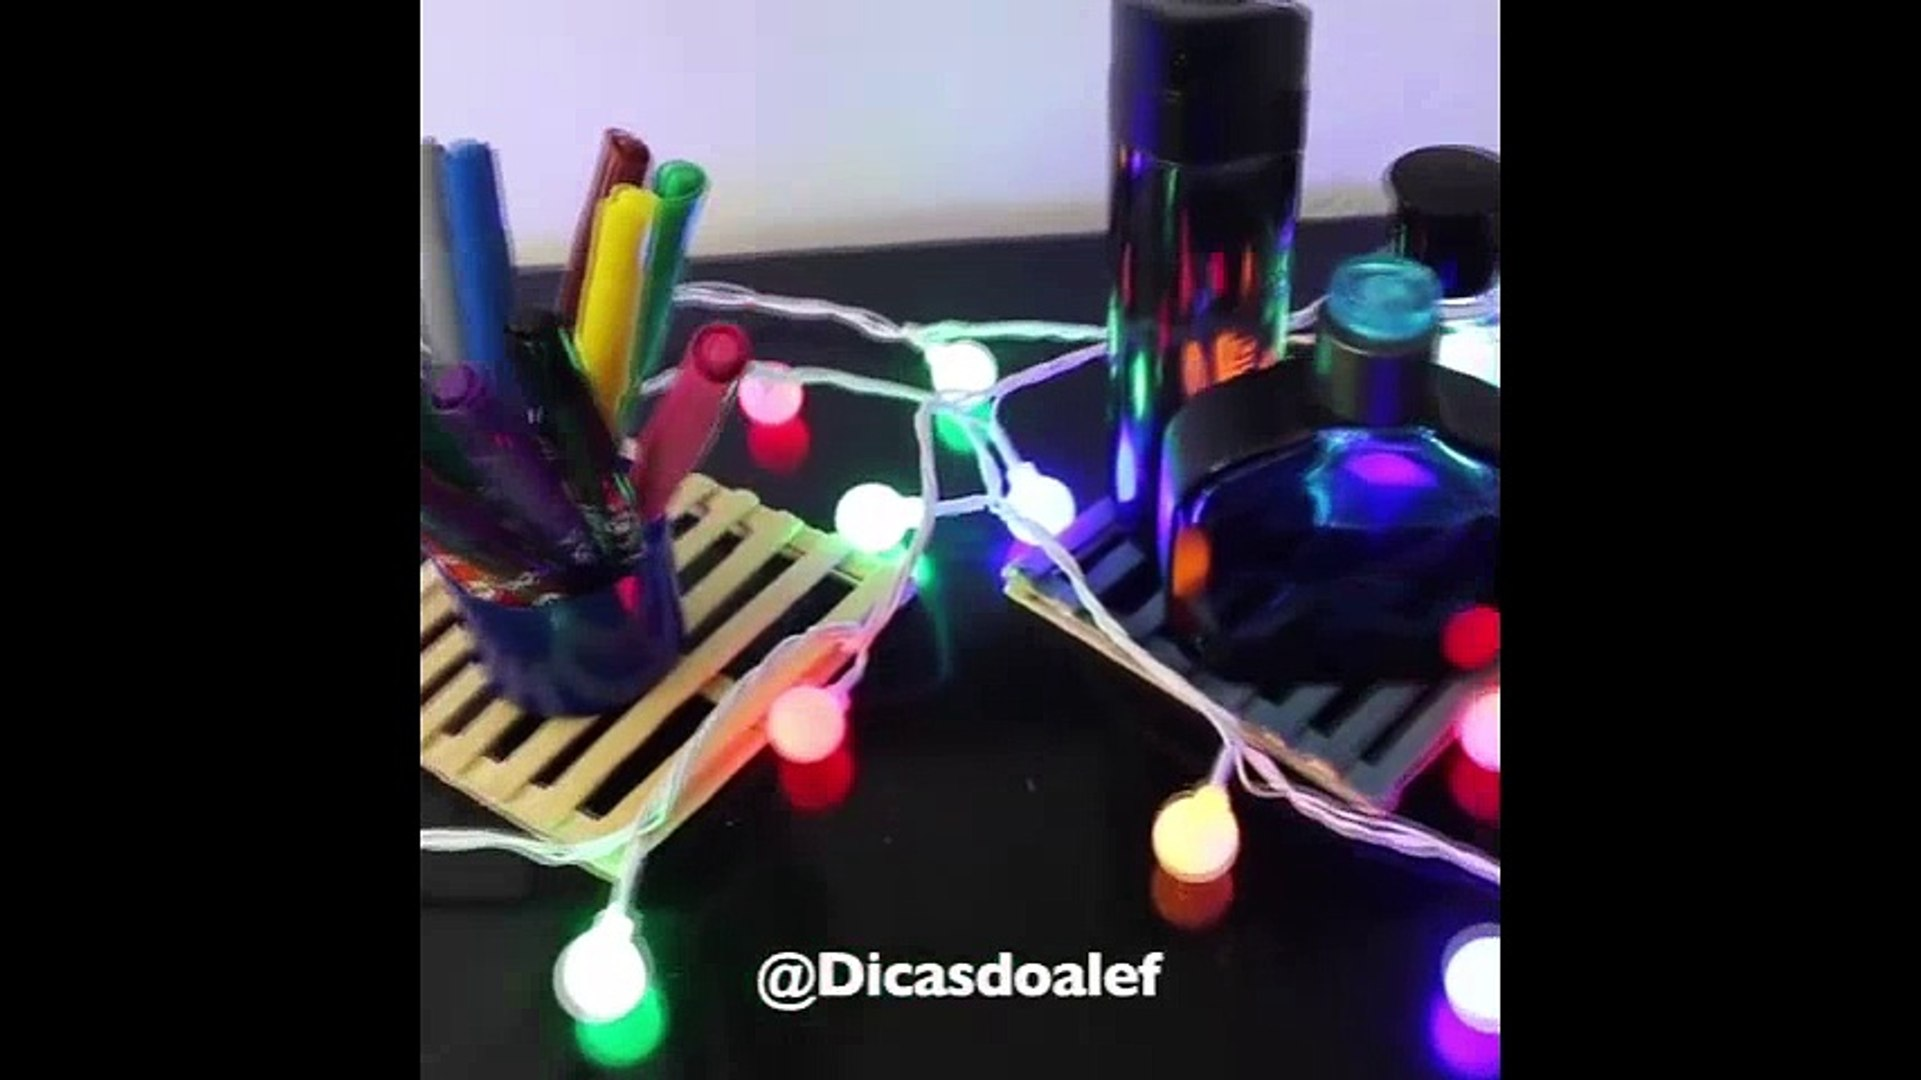 DIY School Supplies! 10 Weird DIY Crafts for Back to School with DIY Lover!